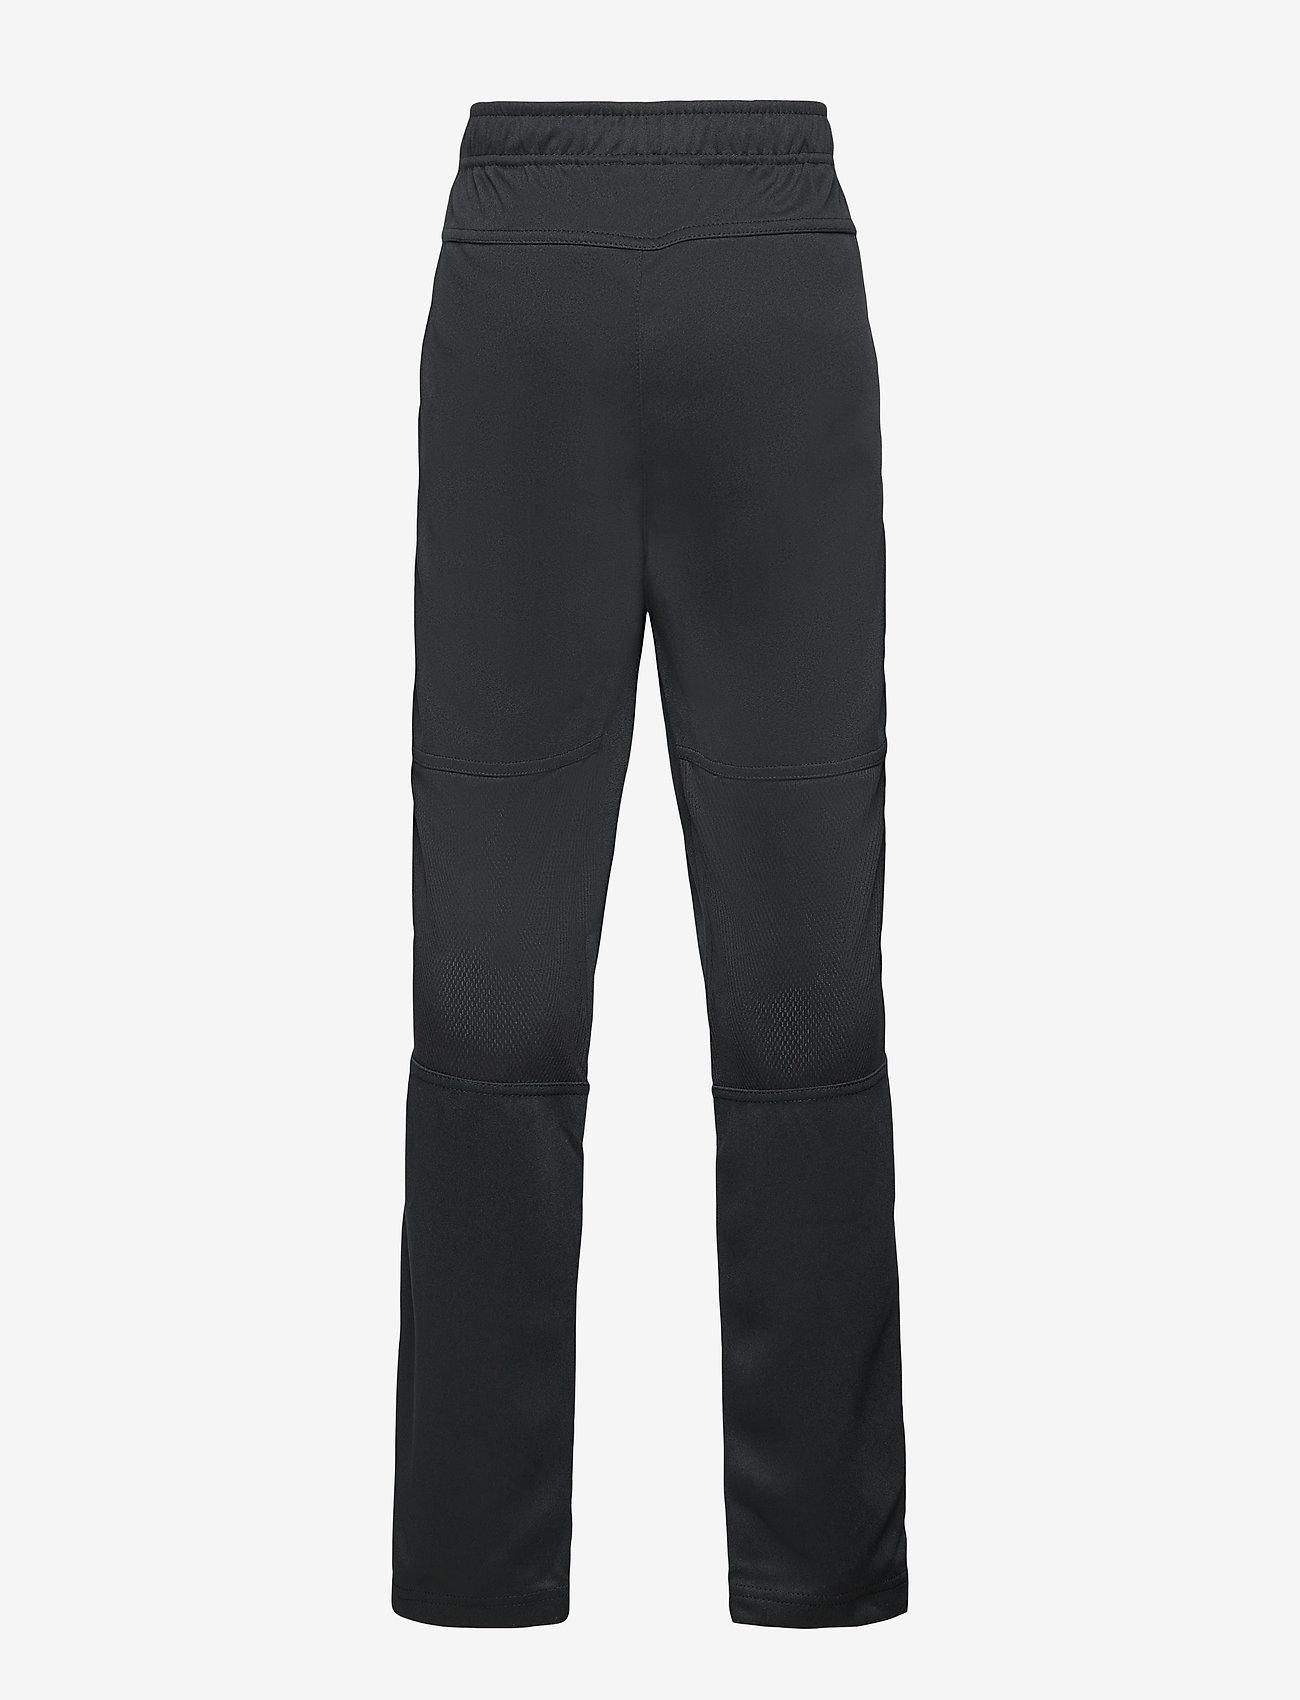 Hummel - CLASSIC BEE PHI PANTS - pantalon de sport - black - 1